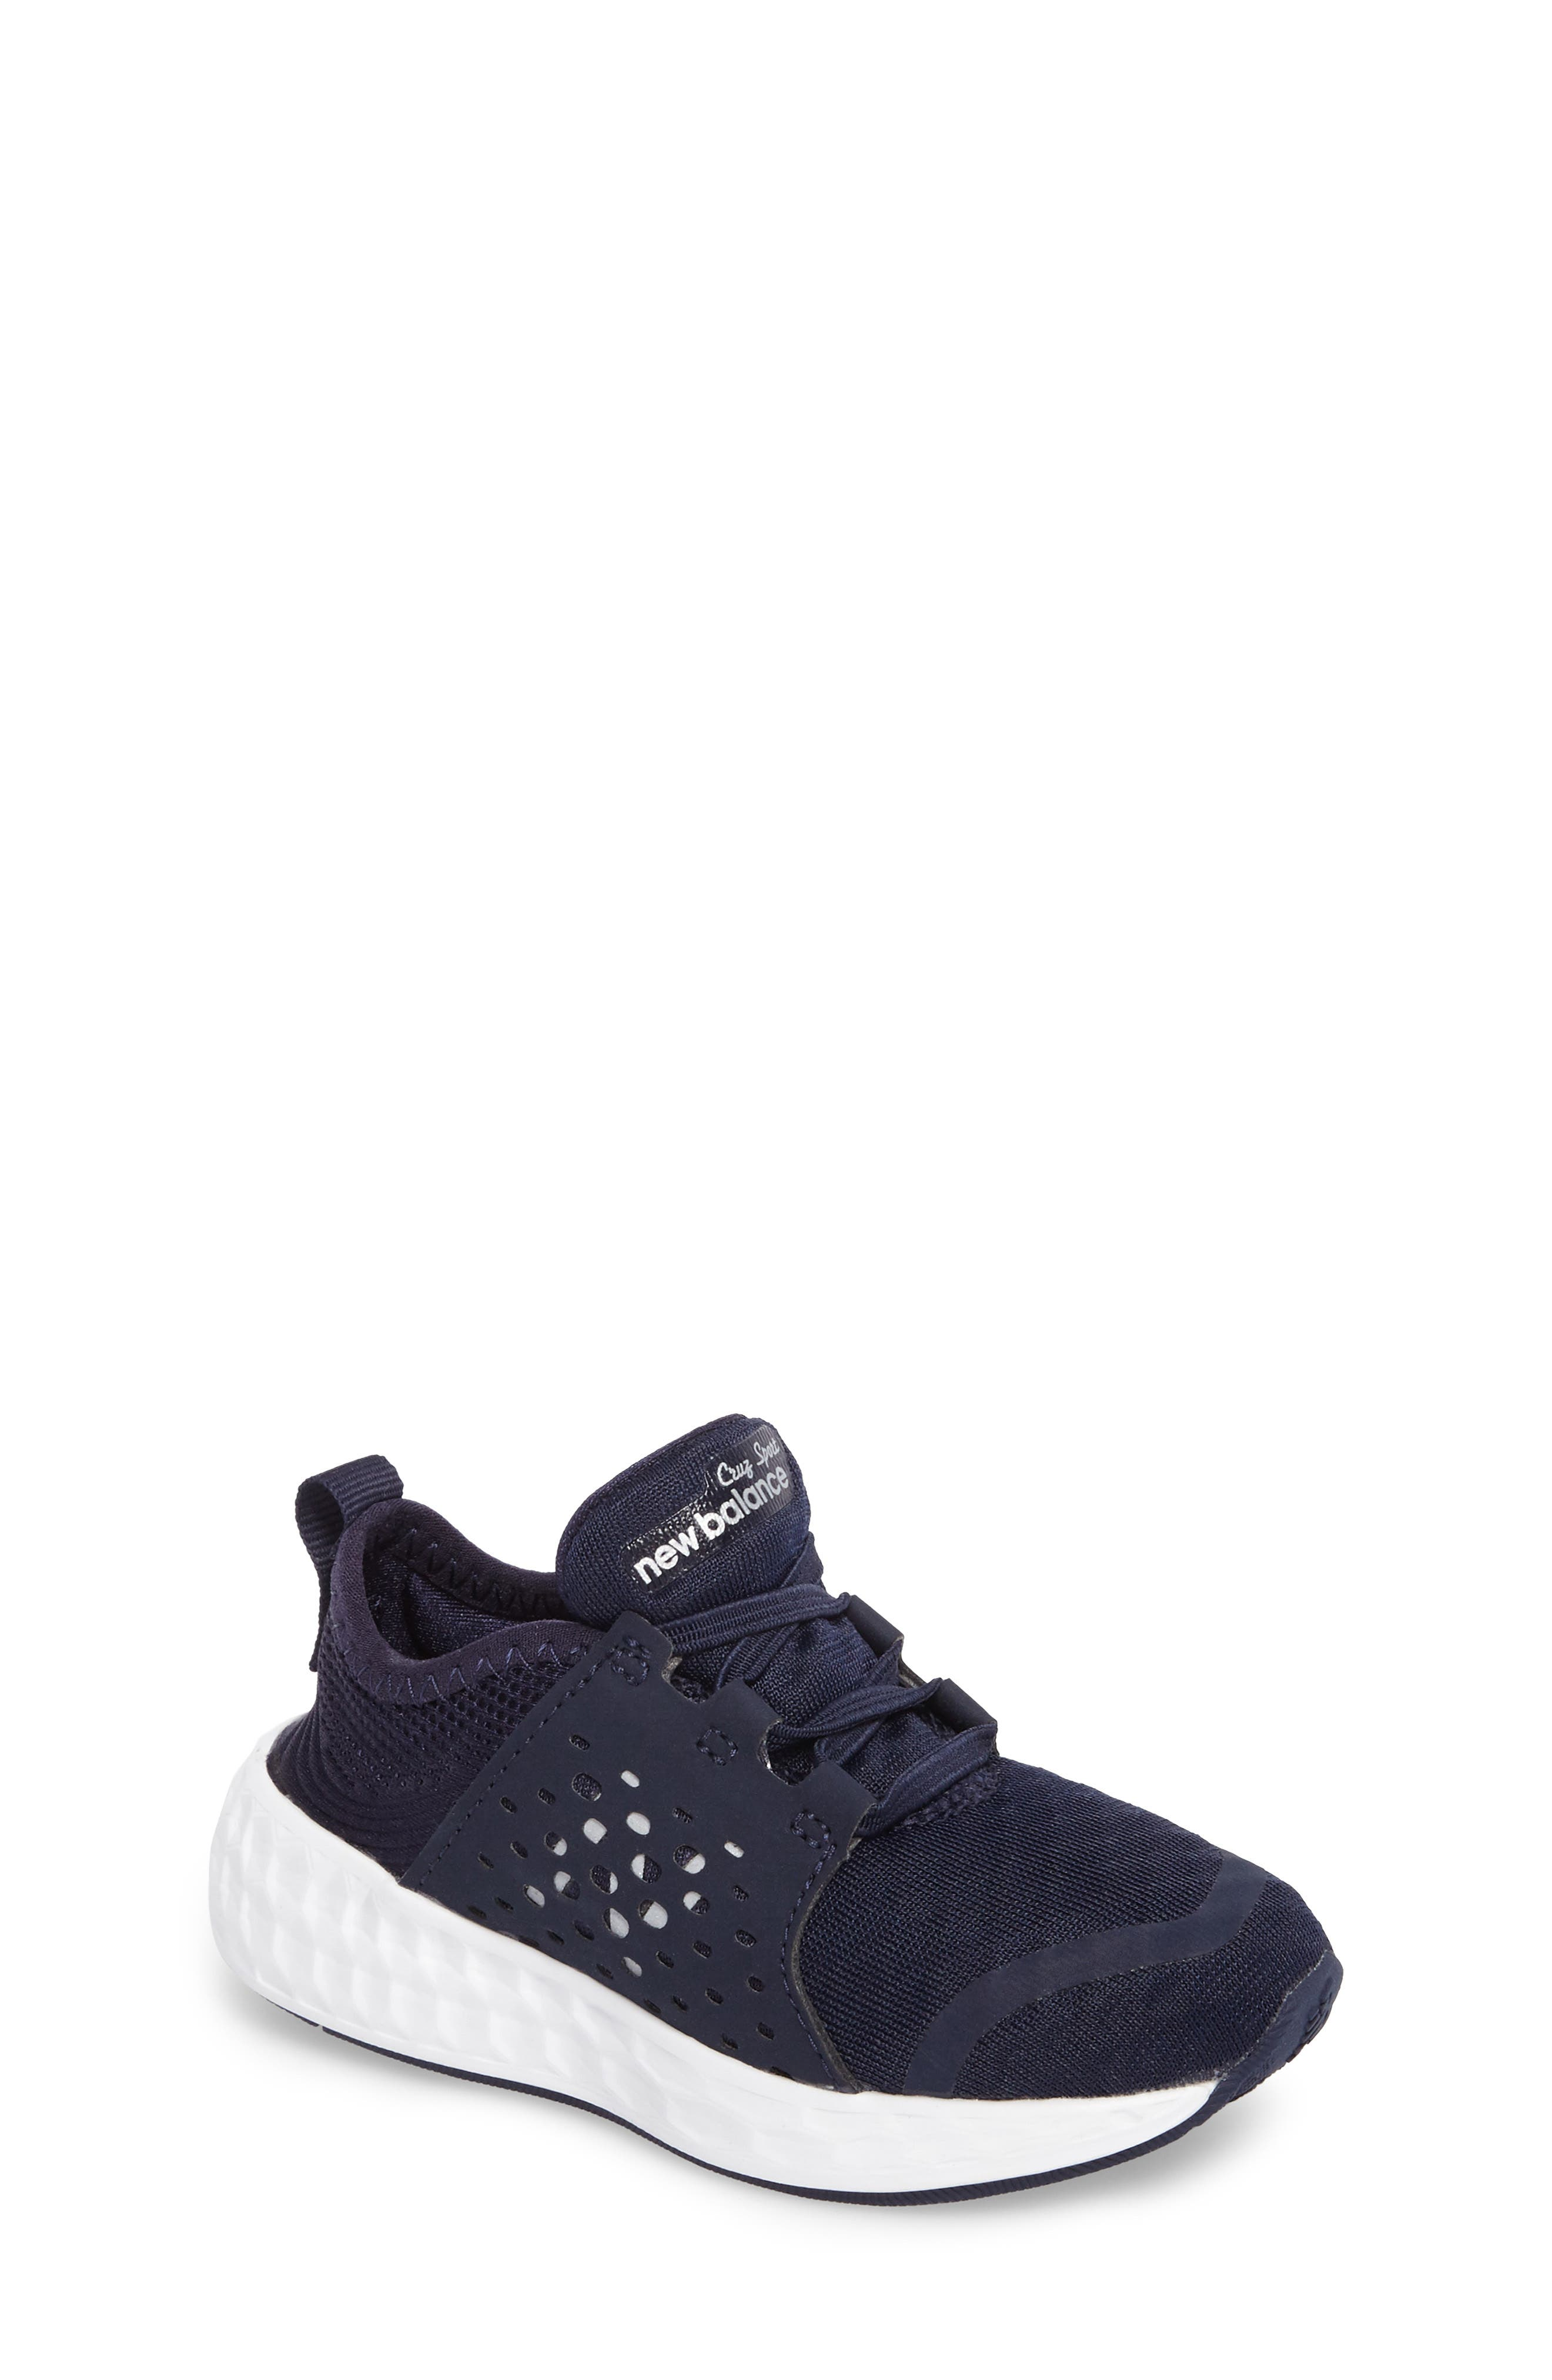 Cruz Sport Sneaker,                             Main thumbnail 1, color,                             Navy/ White